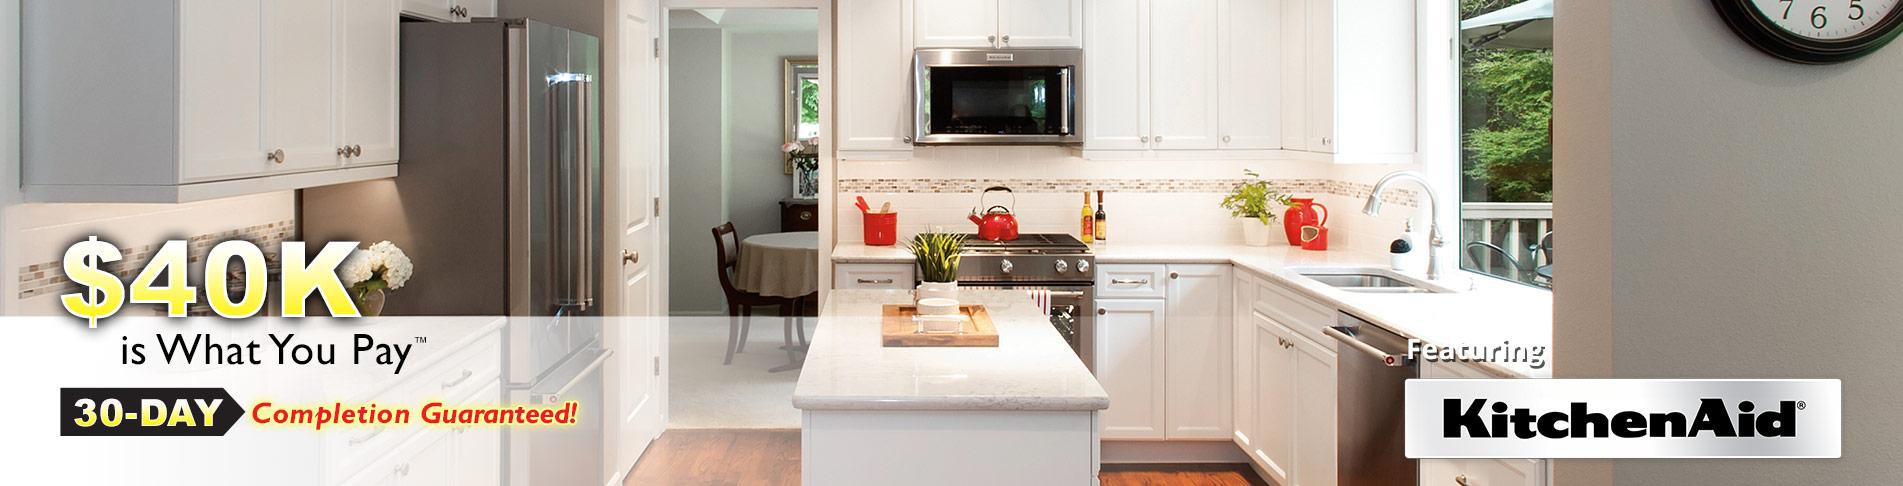 $40k Kitchens